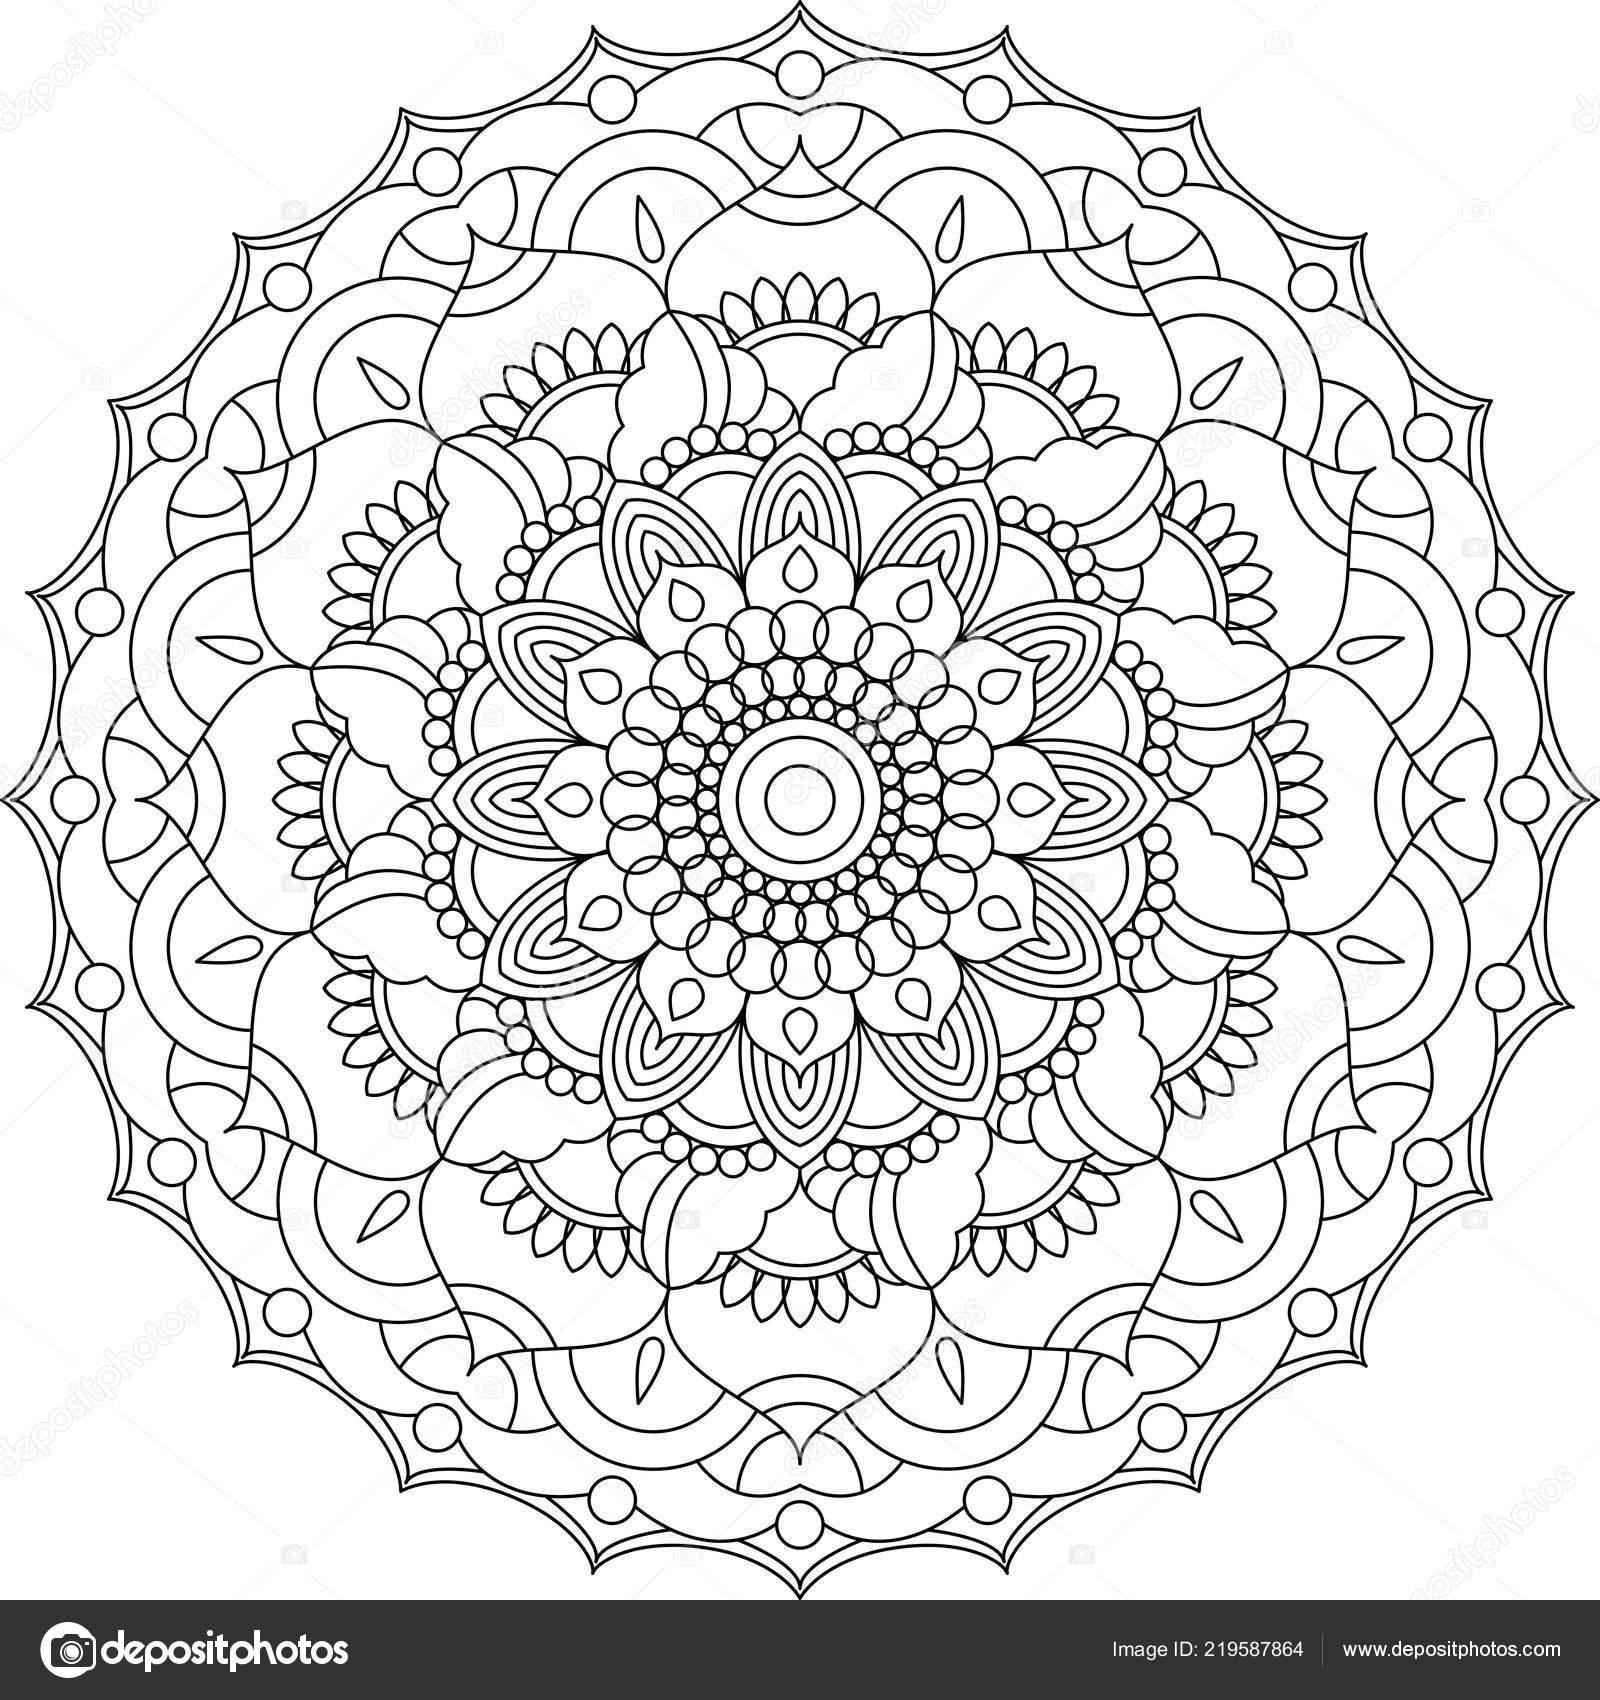 Mandala Coloring Page Adult Coloring Relax Meditation Poster